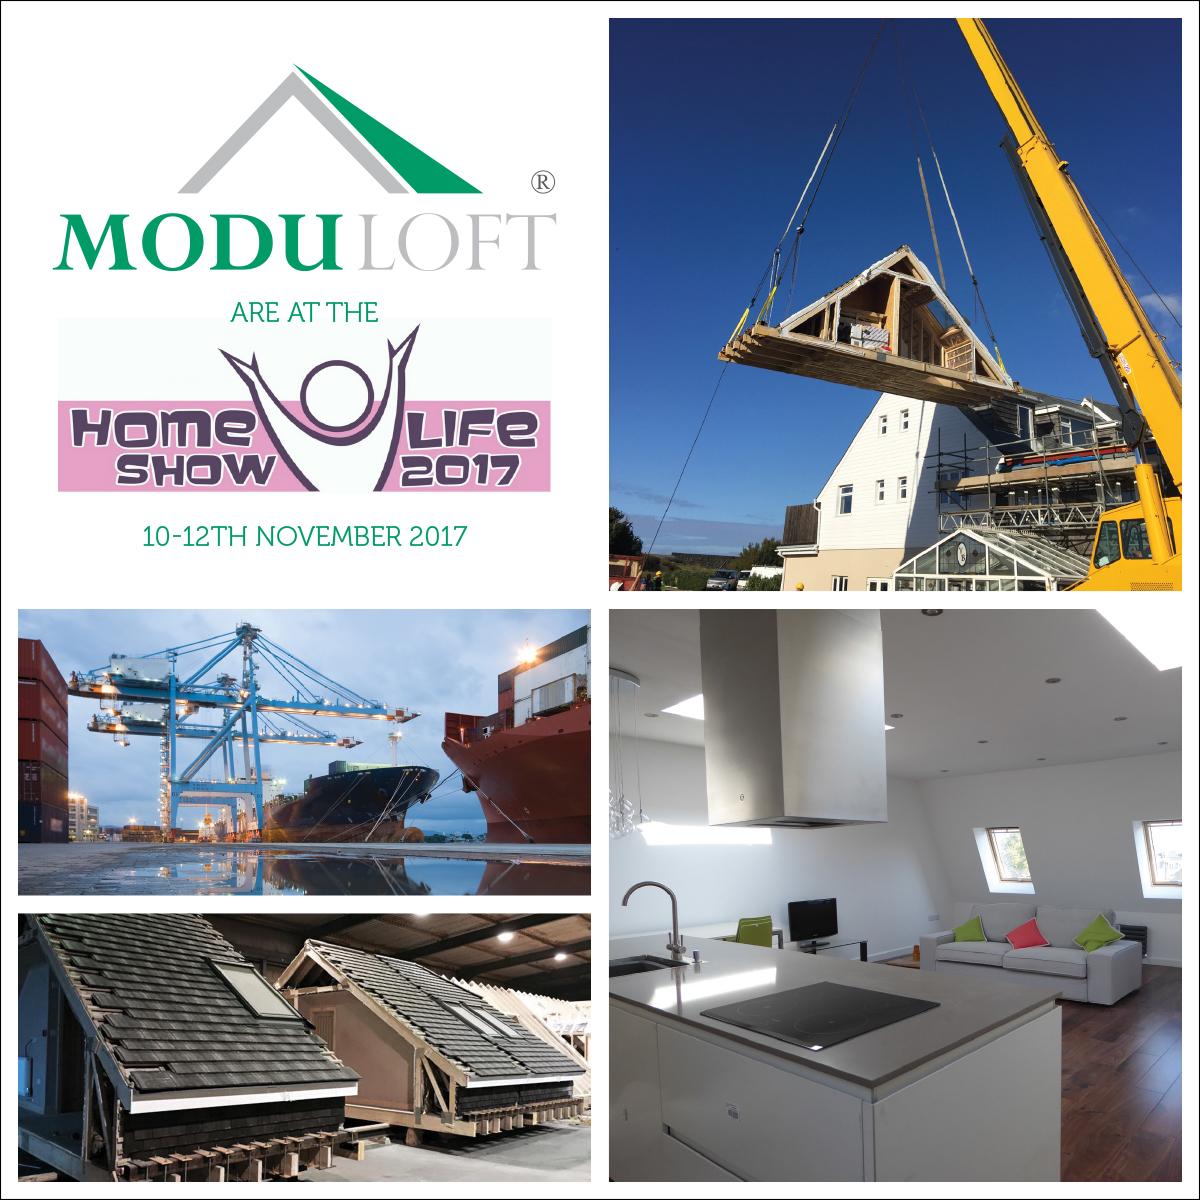 C13698-Moduloft-Home-Life-Show-2017-Facebook-Graphics-1